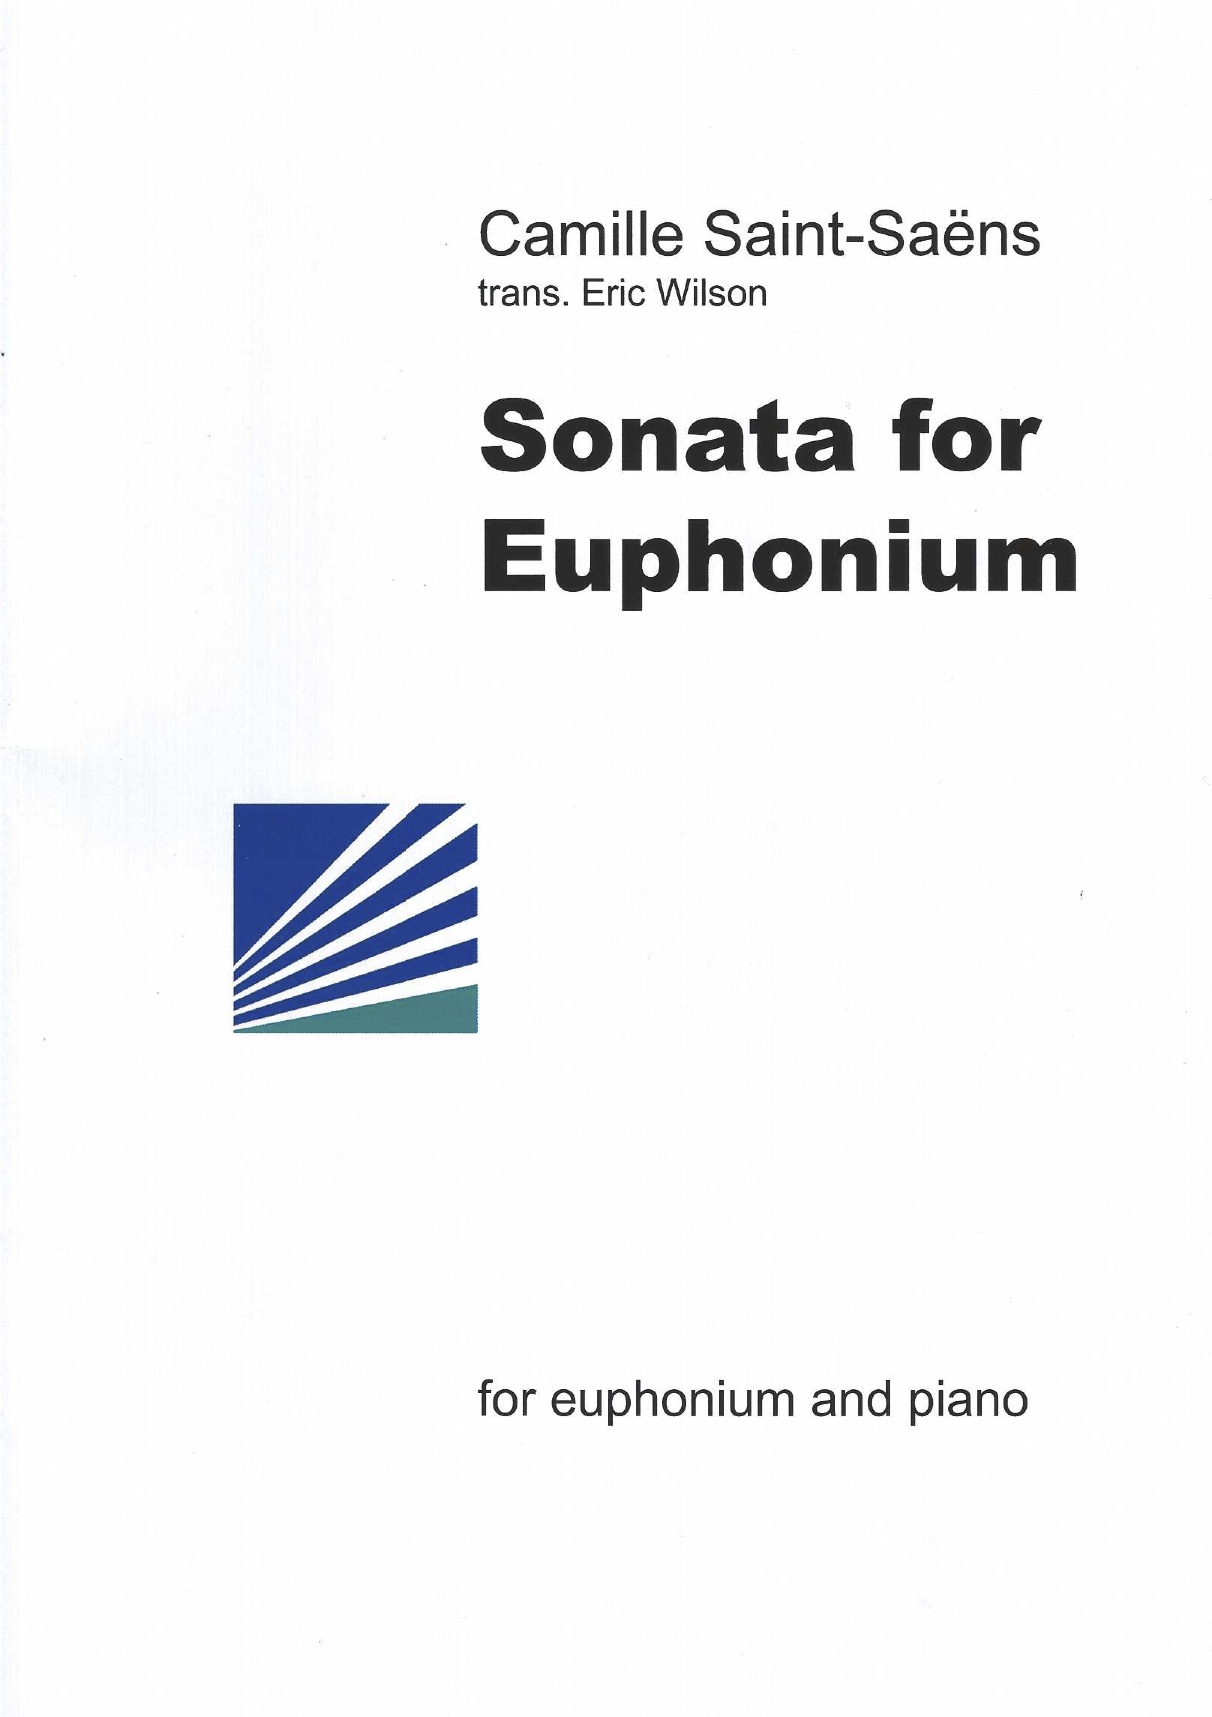 Sonata for Euphonium (originally Bassoon) - C.Saint Saens  Arr.E.Wilson- Euphonium and Piano